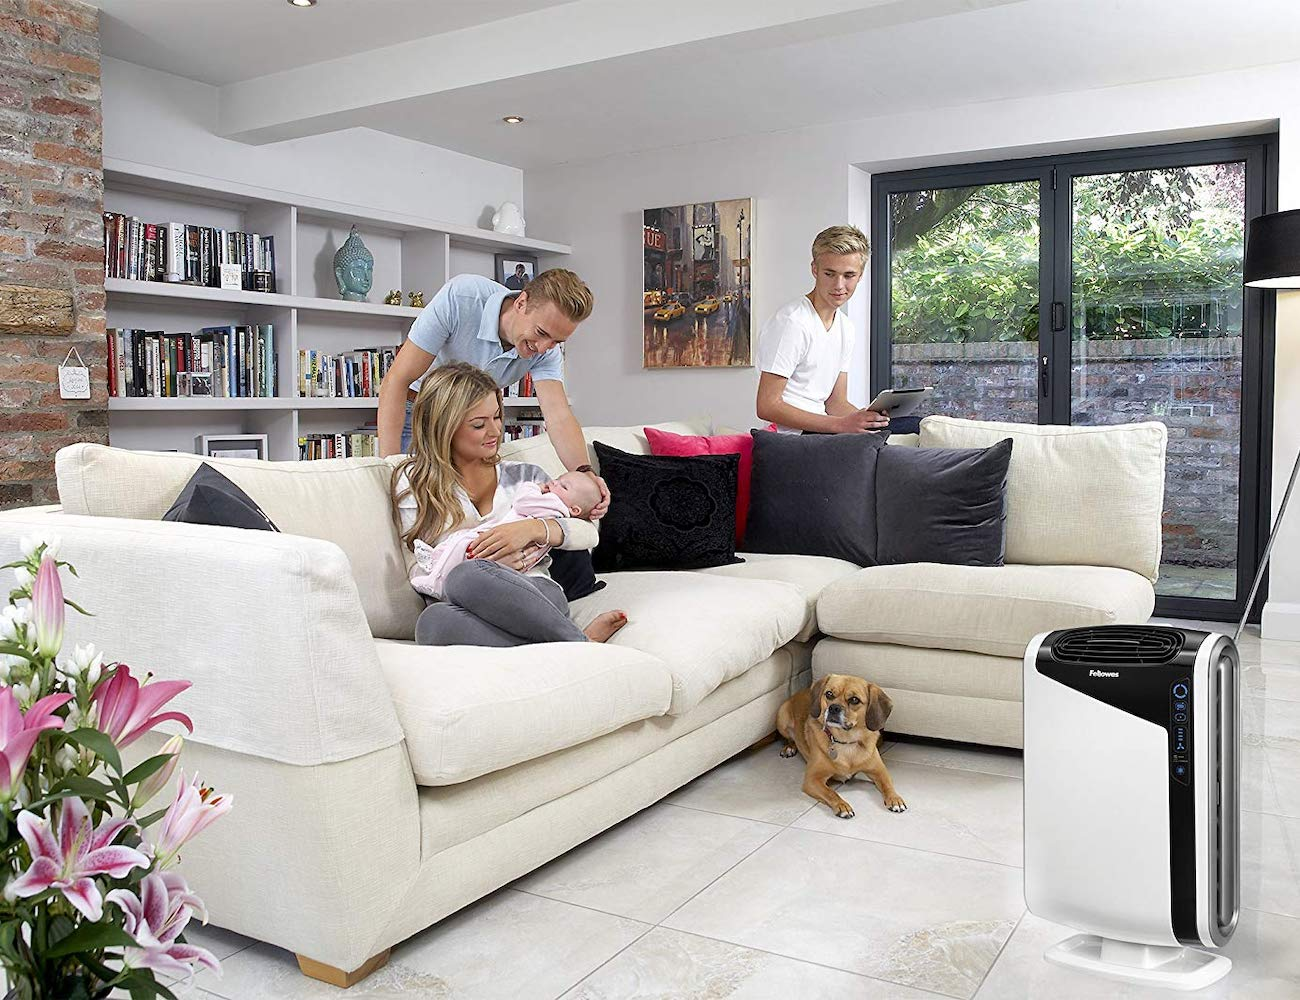 AeraMax 300 Large Room Air Purifier